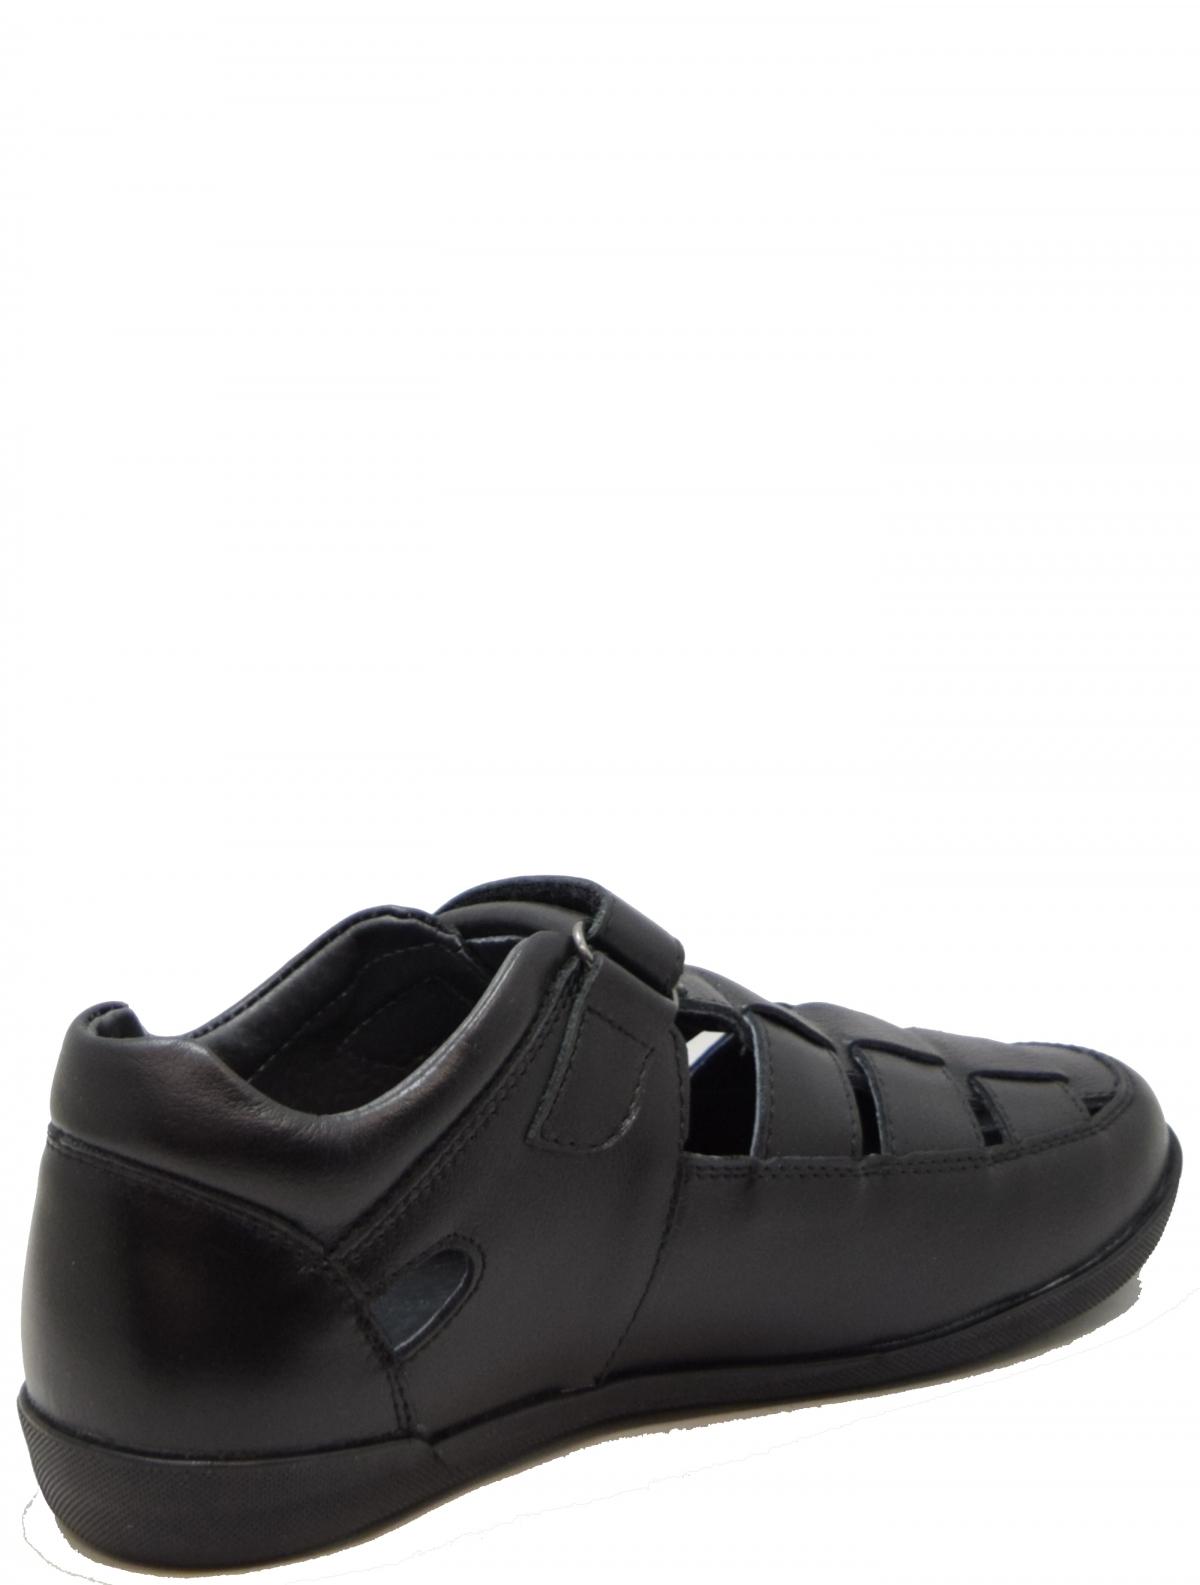 NewGen M3047/0 туфли для мальчика